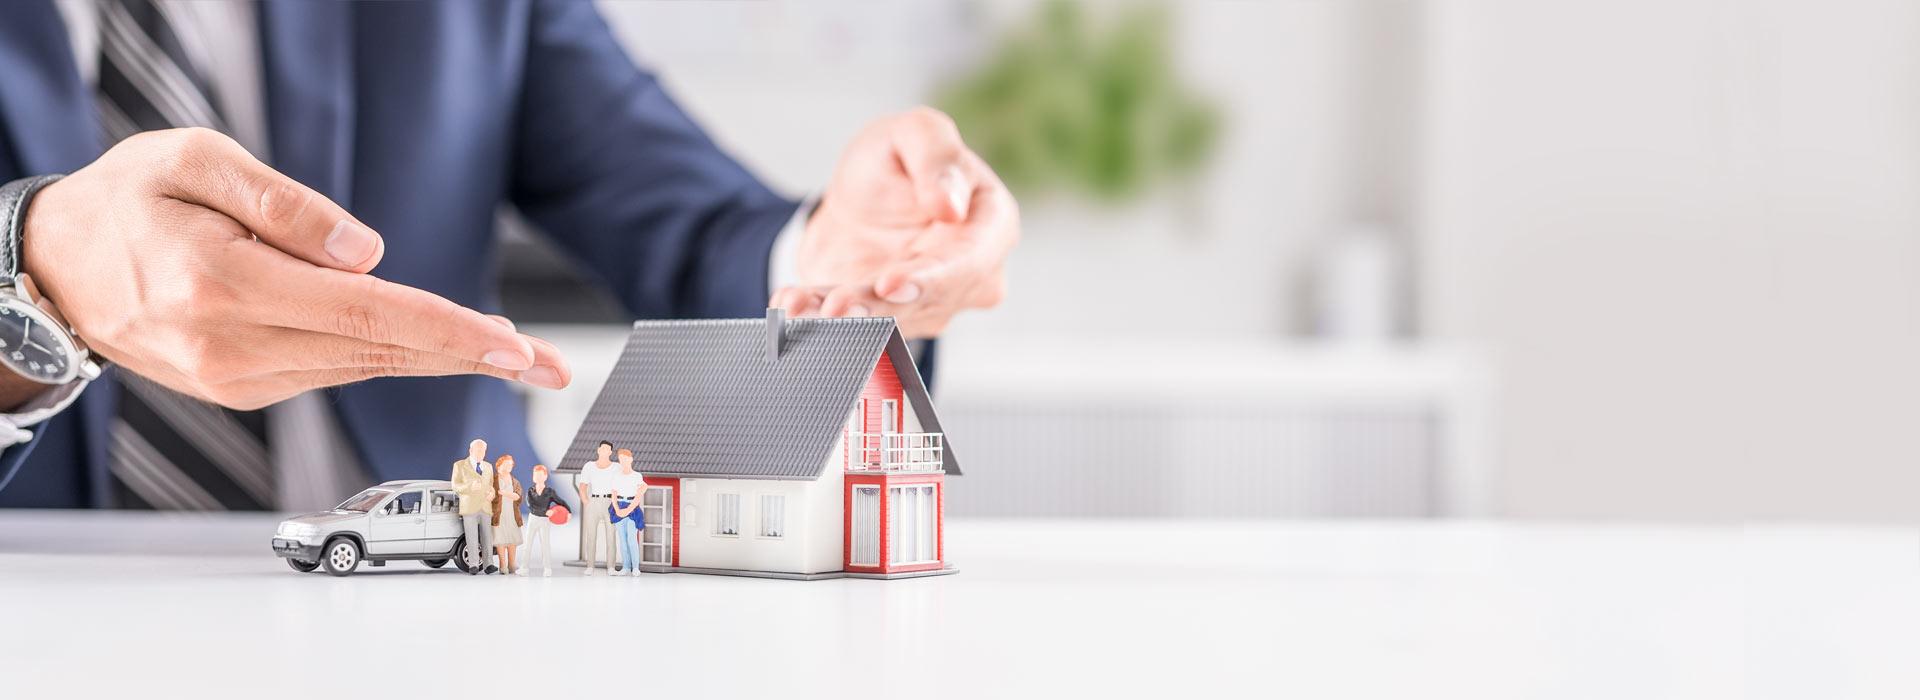 Asesor de Hipotecas